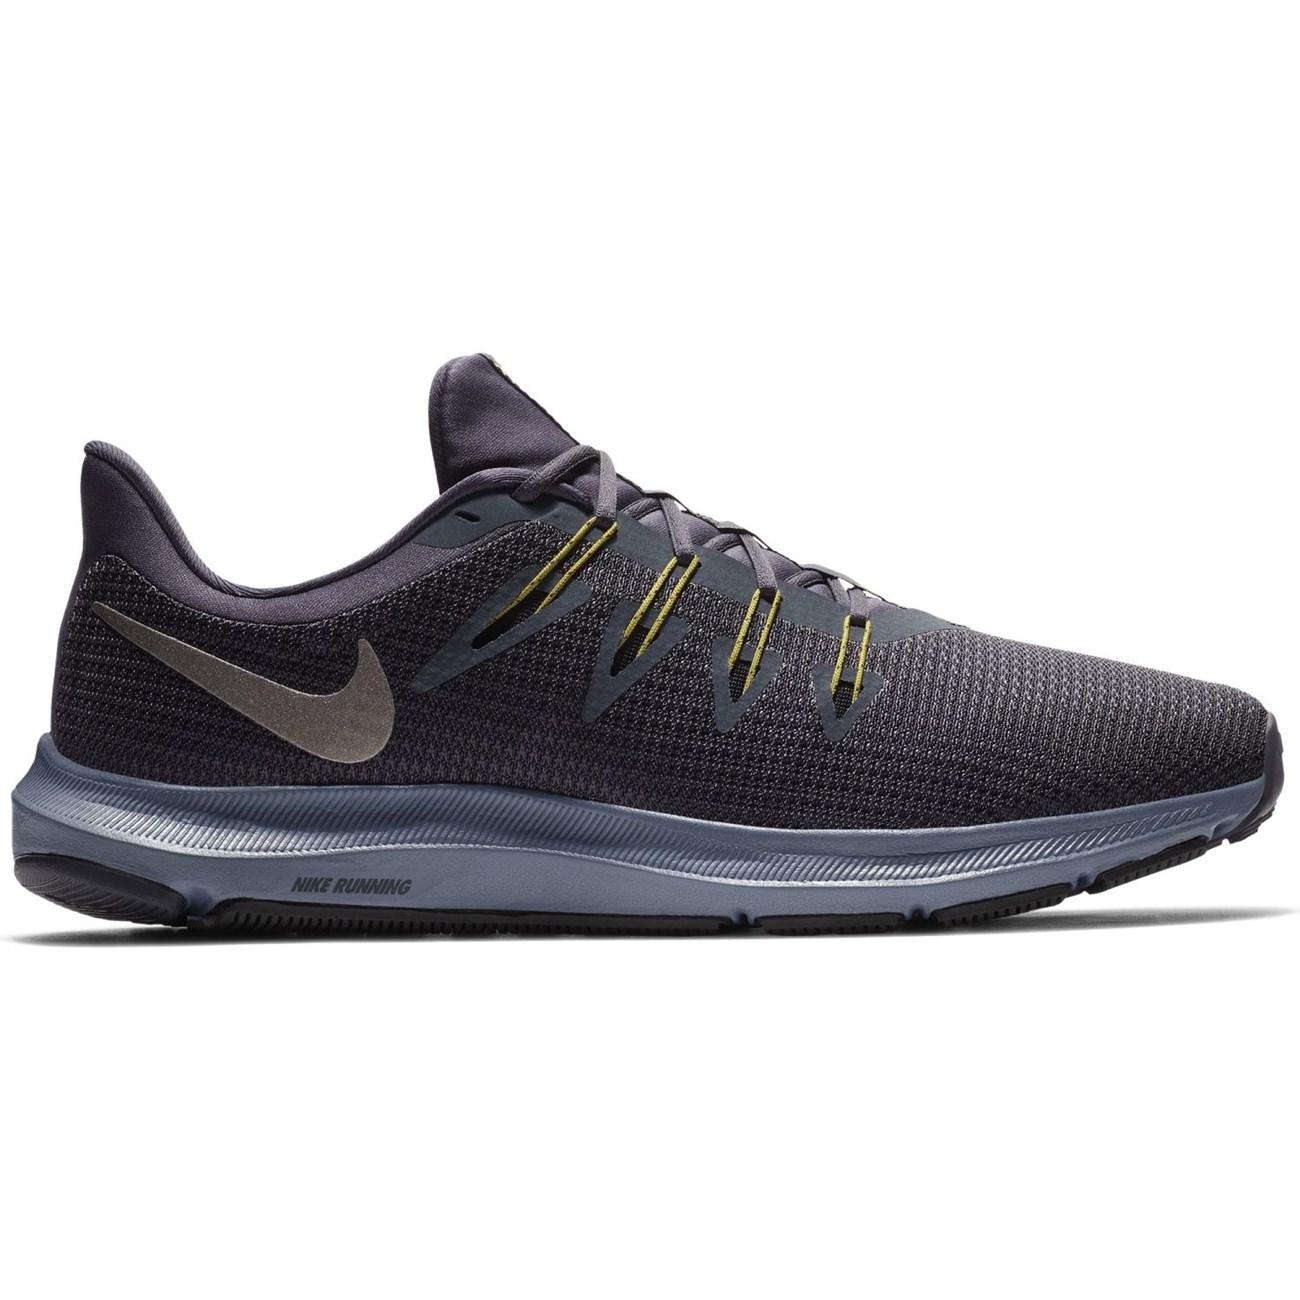 28c8d74b845 NIKE QUEST < Παπούτσια για Τρέξιμο | INTERSPORT